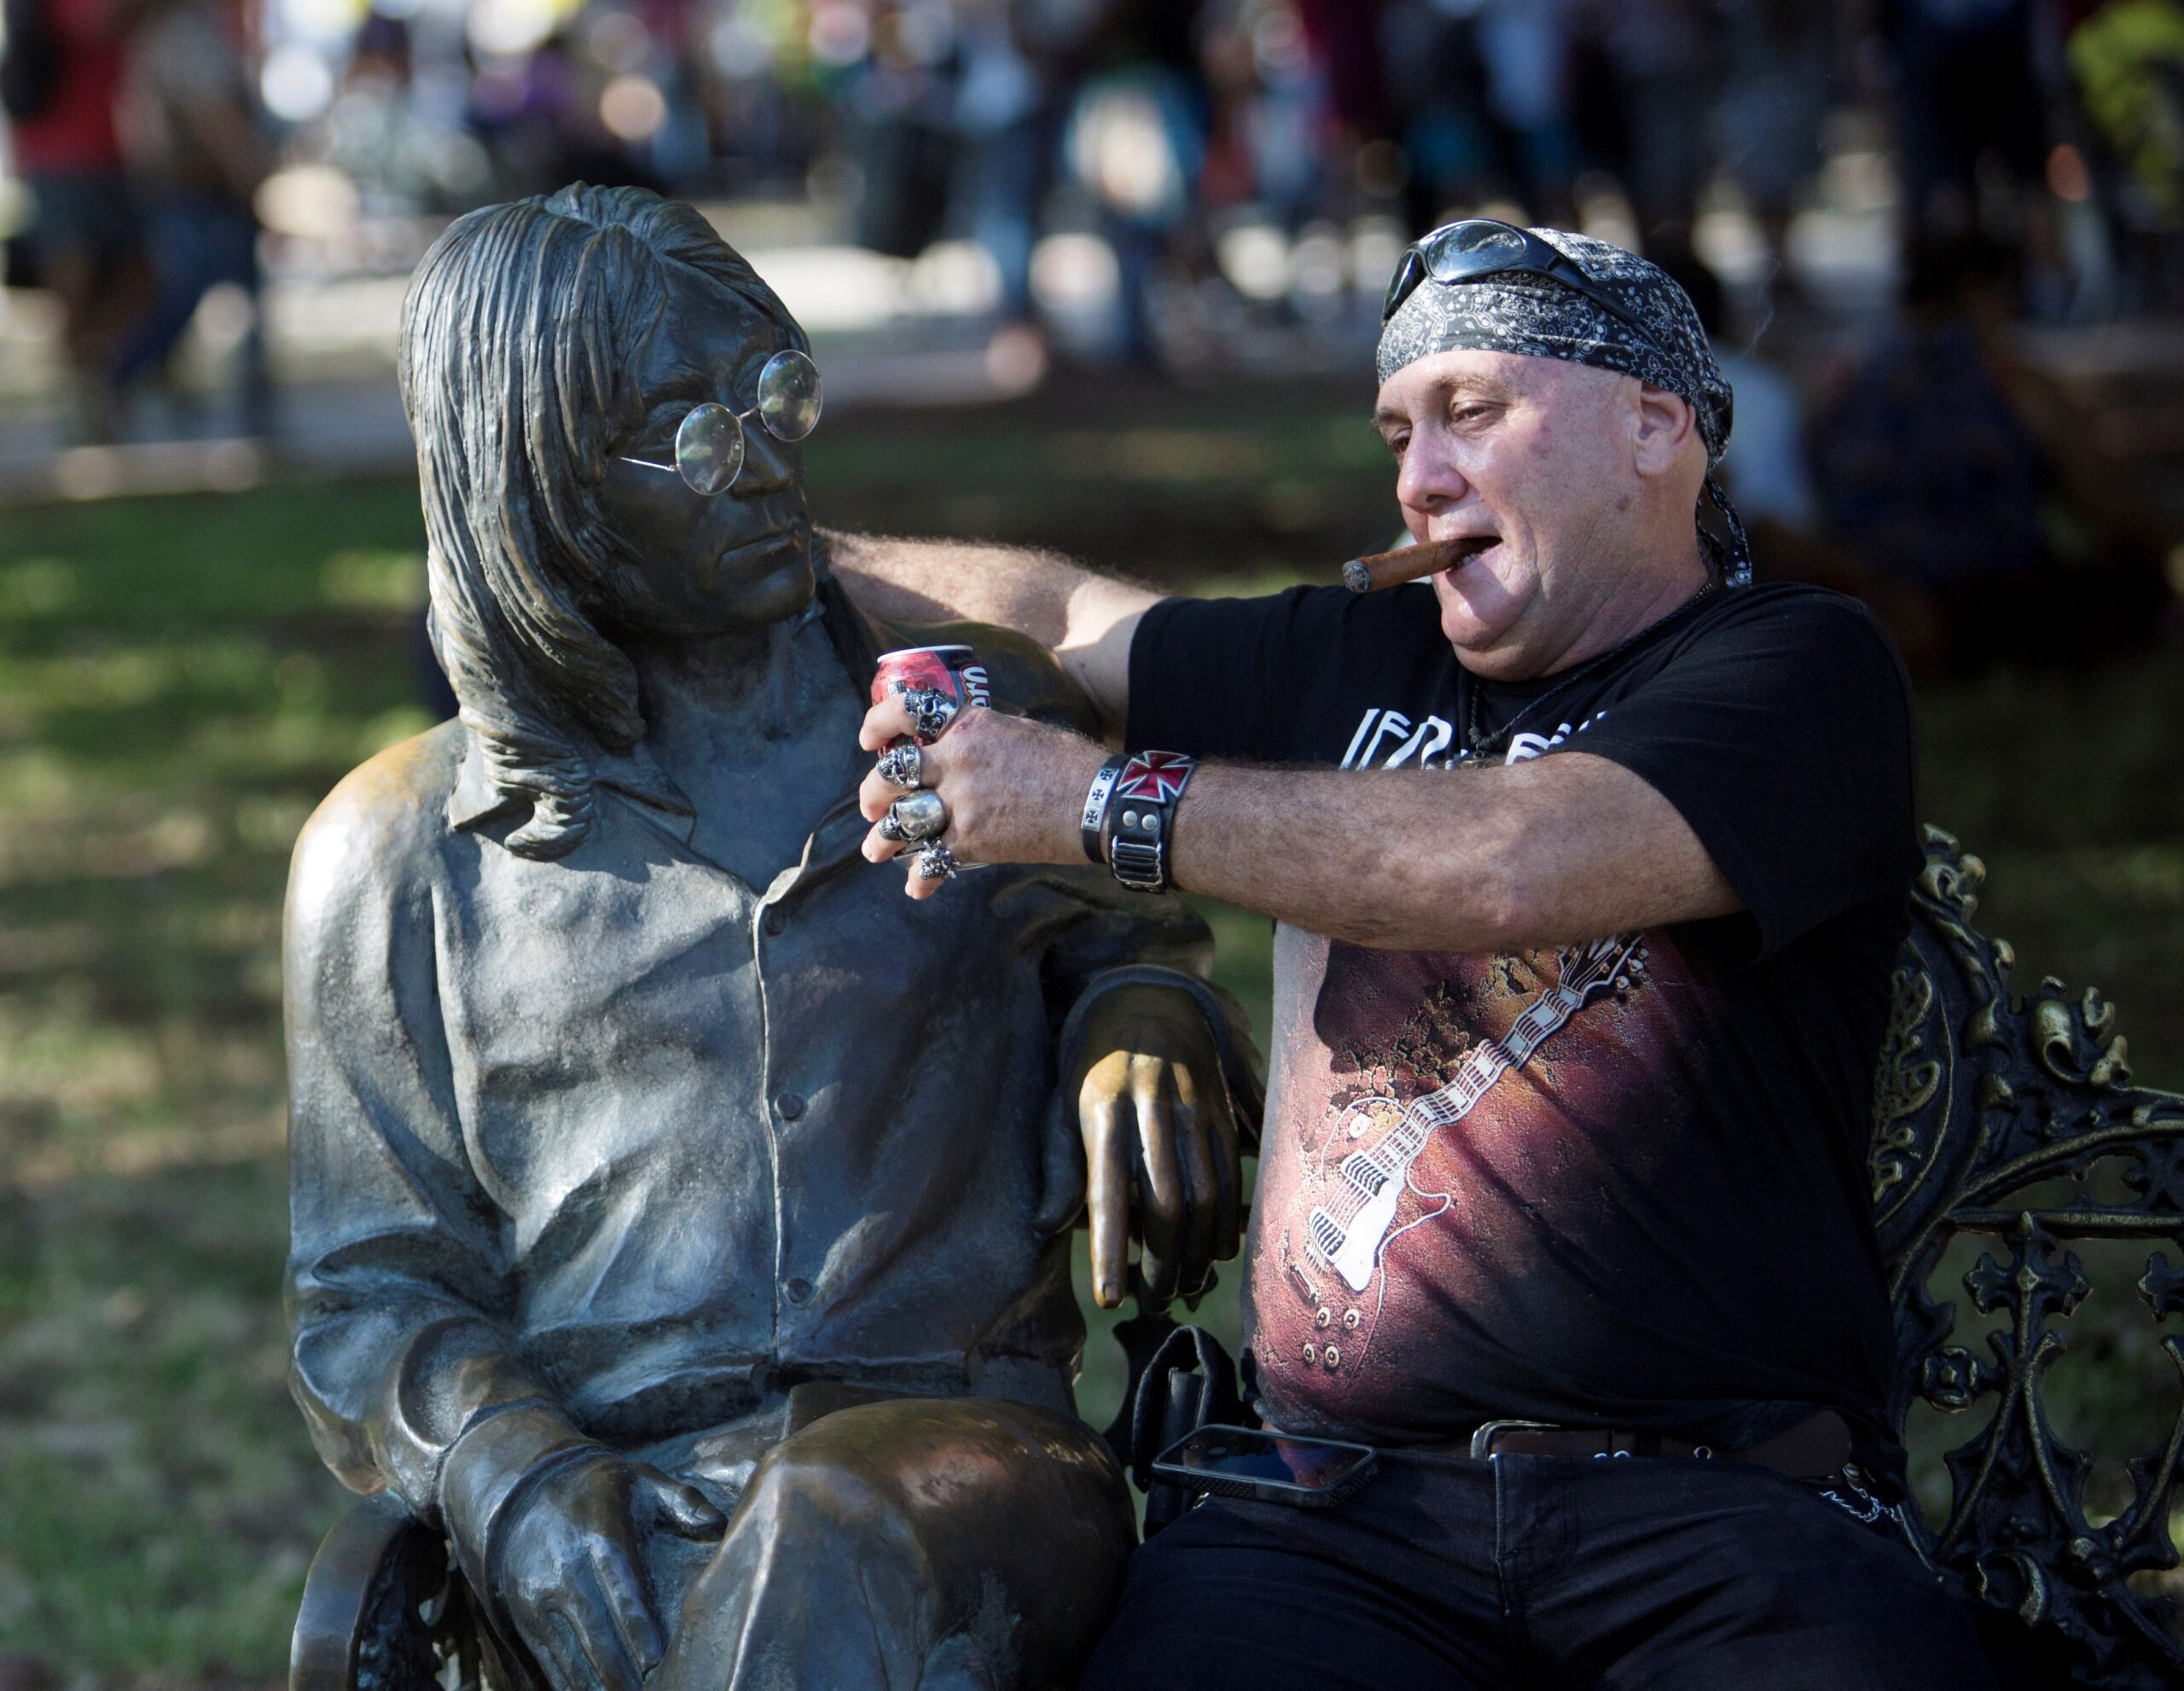 Rūko cigarą, geria alų, apkabinęs skulptūrą.